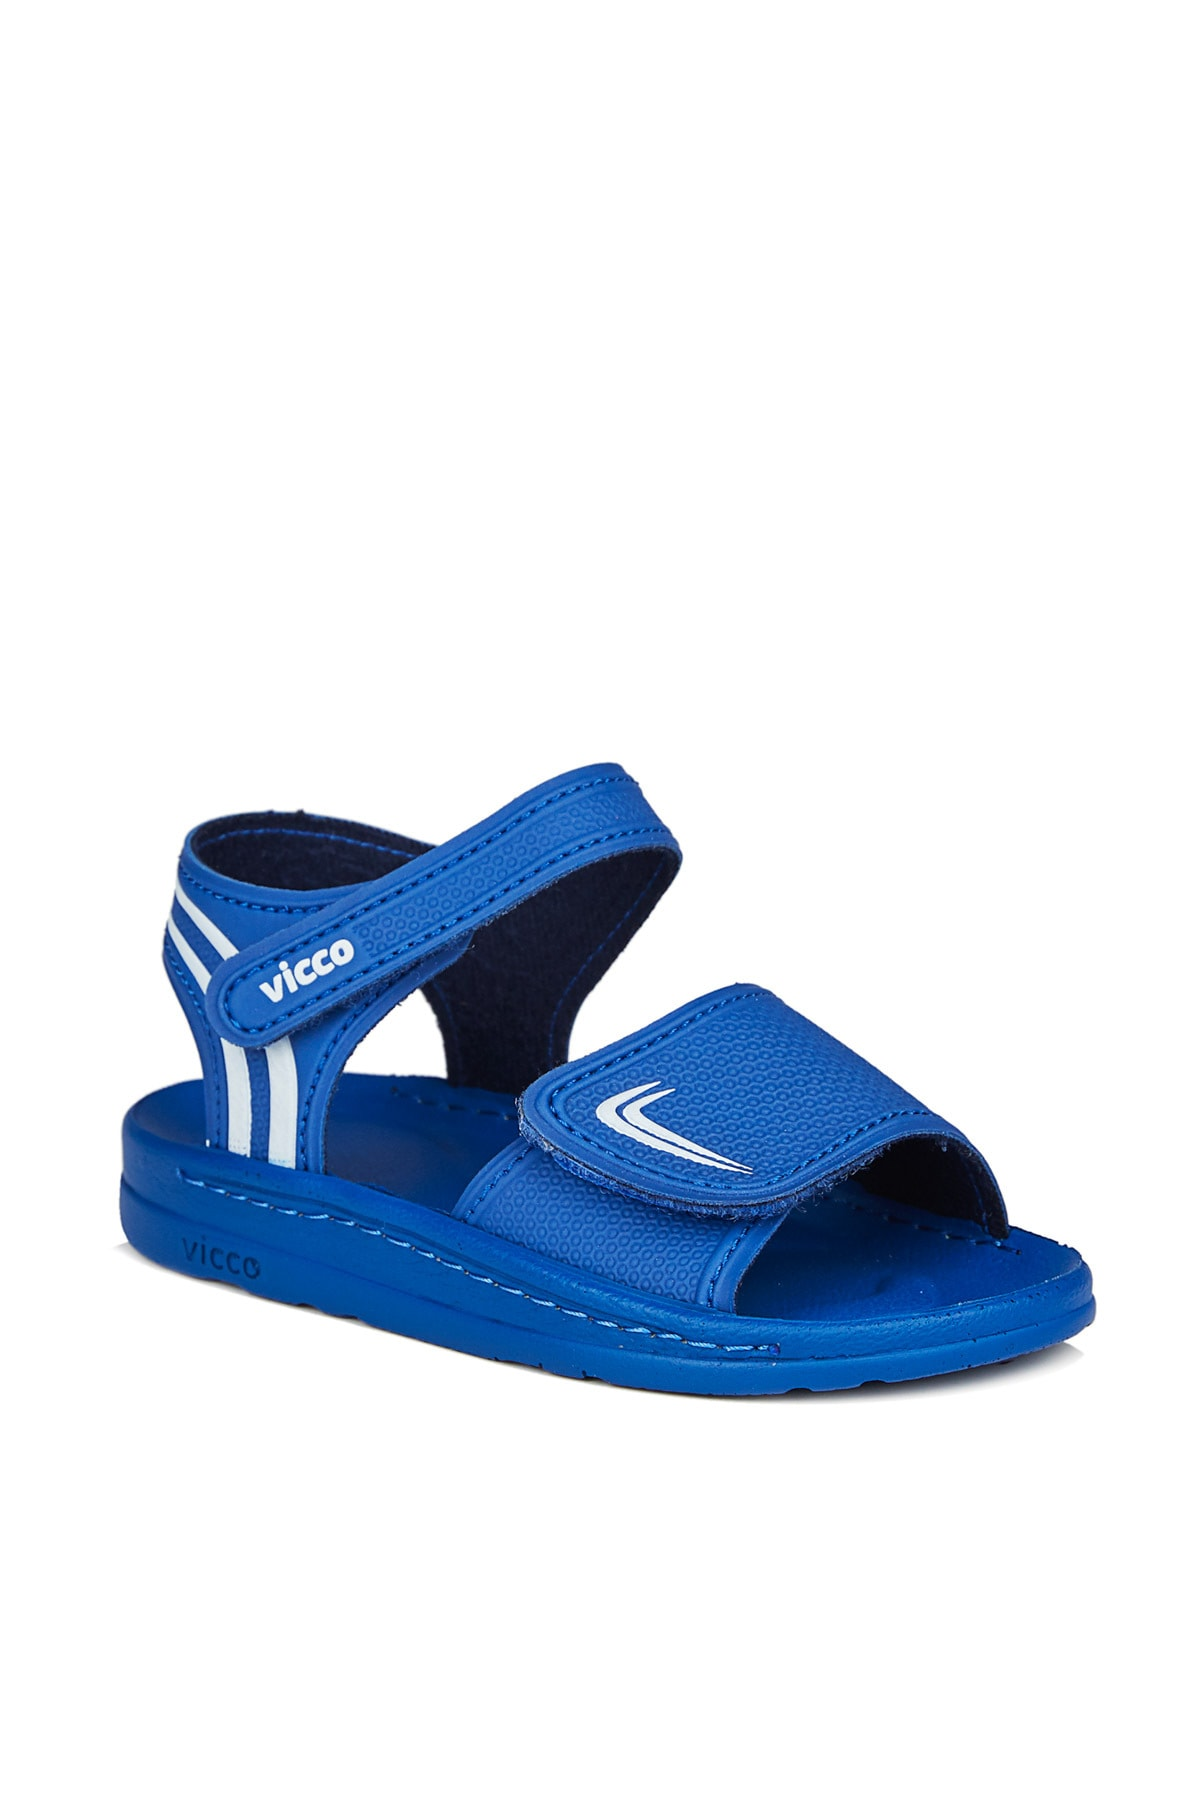 Vicco Dory Erkek Çocuk Saks Mavi Sandalet 1